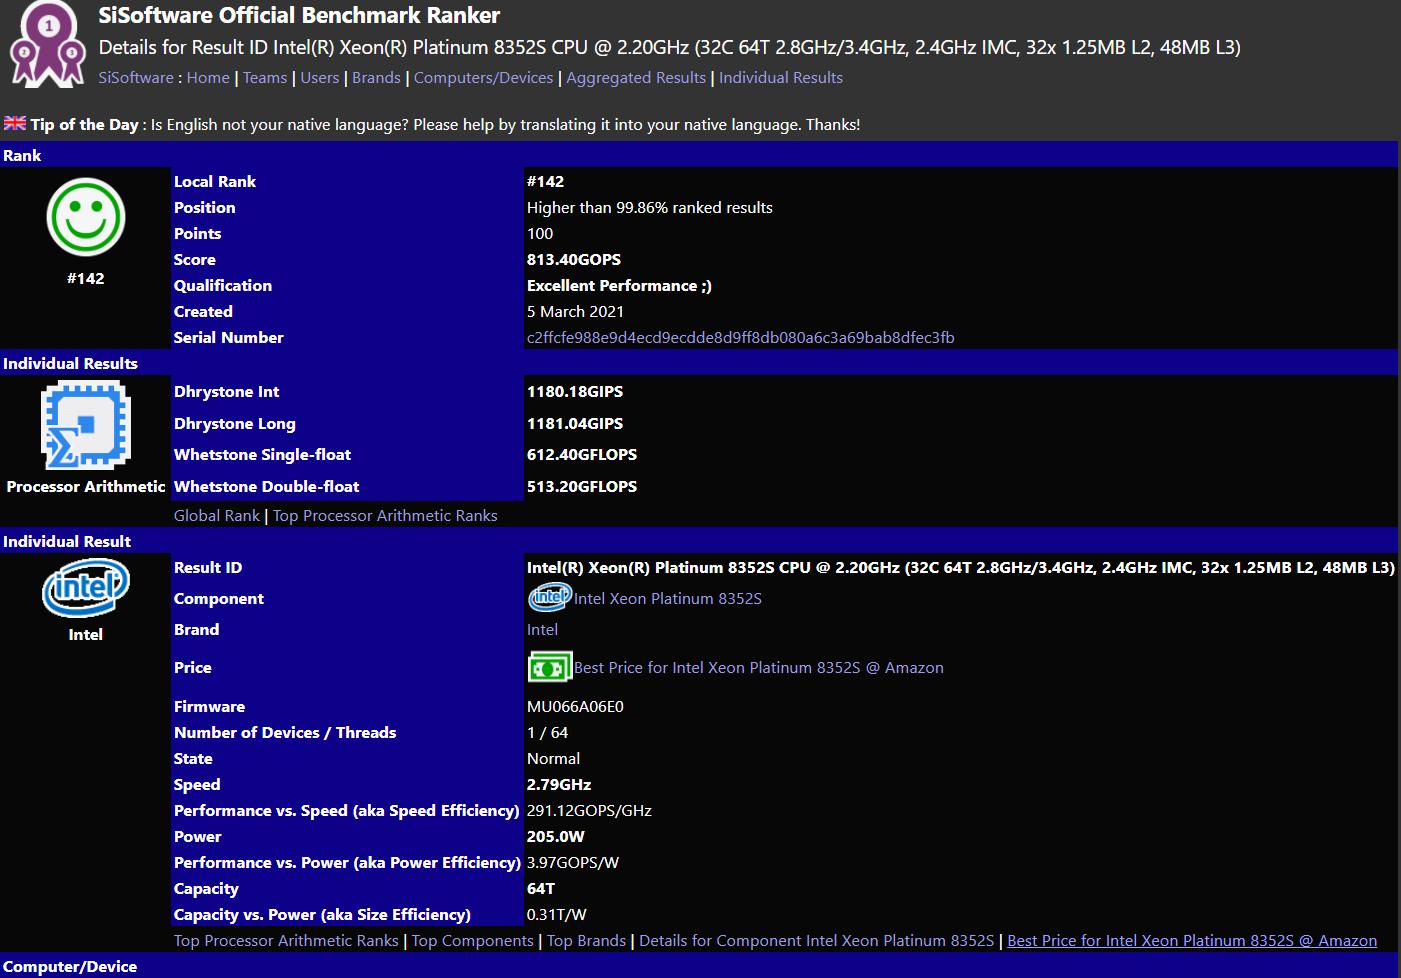 intel-xeon-platinum-8352s-32-core-server-cpu-_-3rd-gen-ice-lake-sp-_1